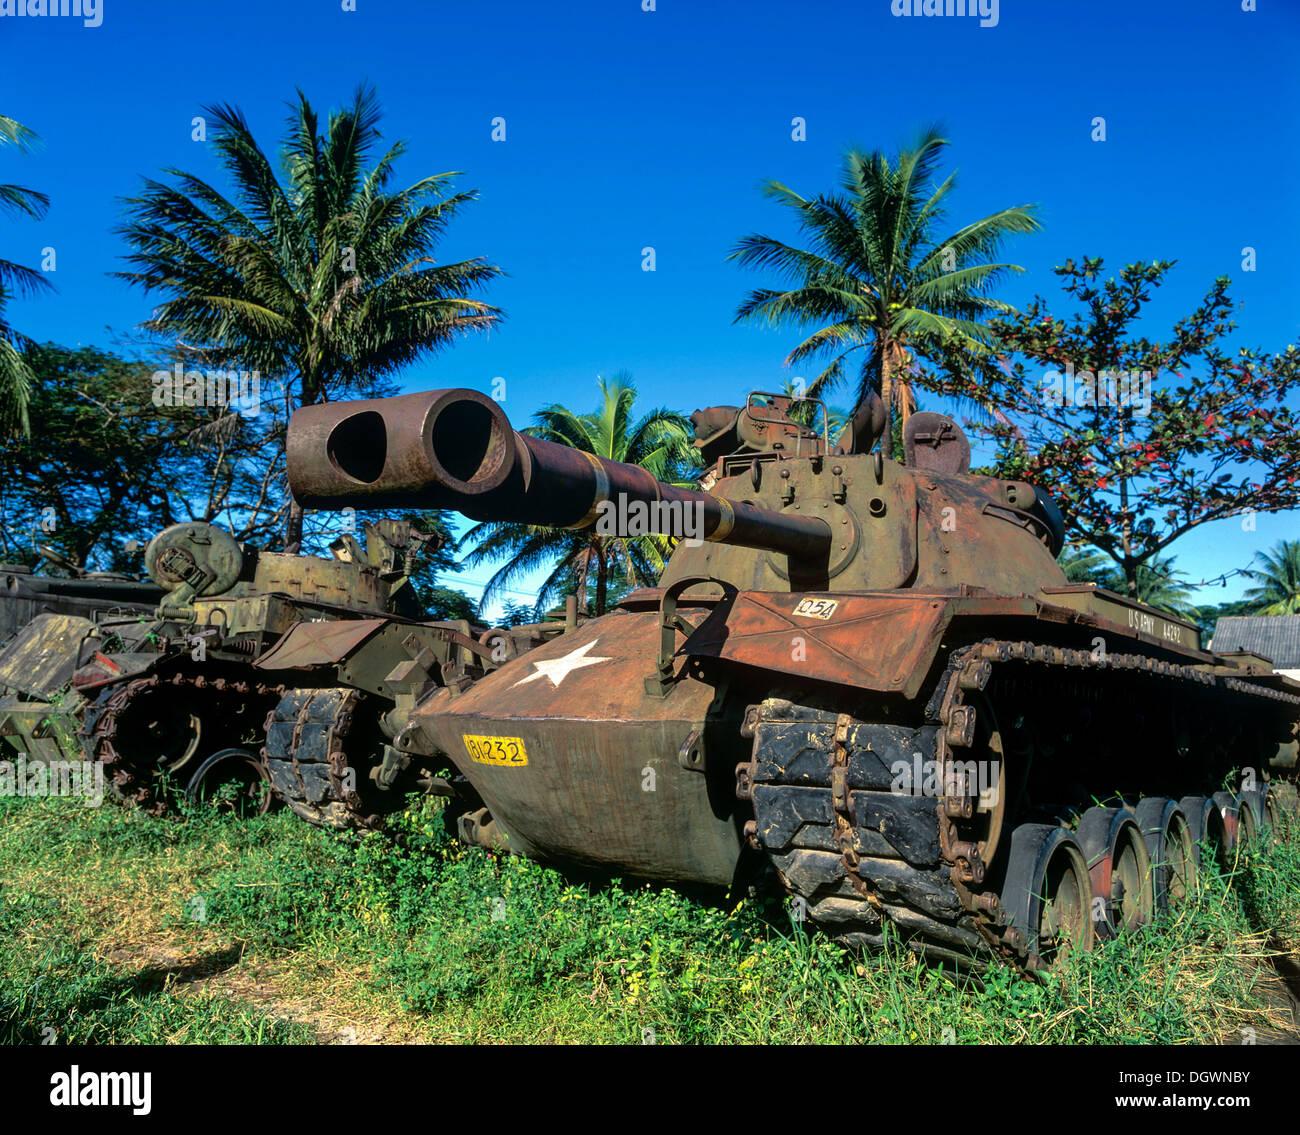 M48 tank from the U.S. Army, Hue, Provinz Thua Thien-Hue, Vietnam - Stock Image